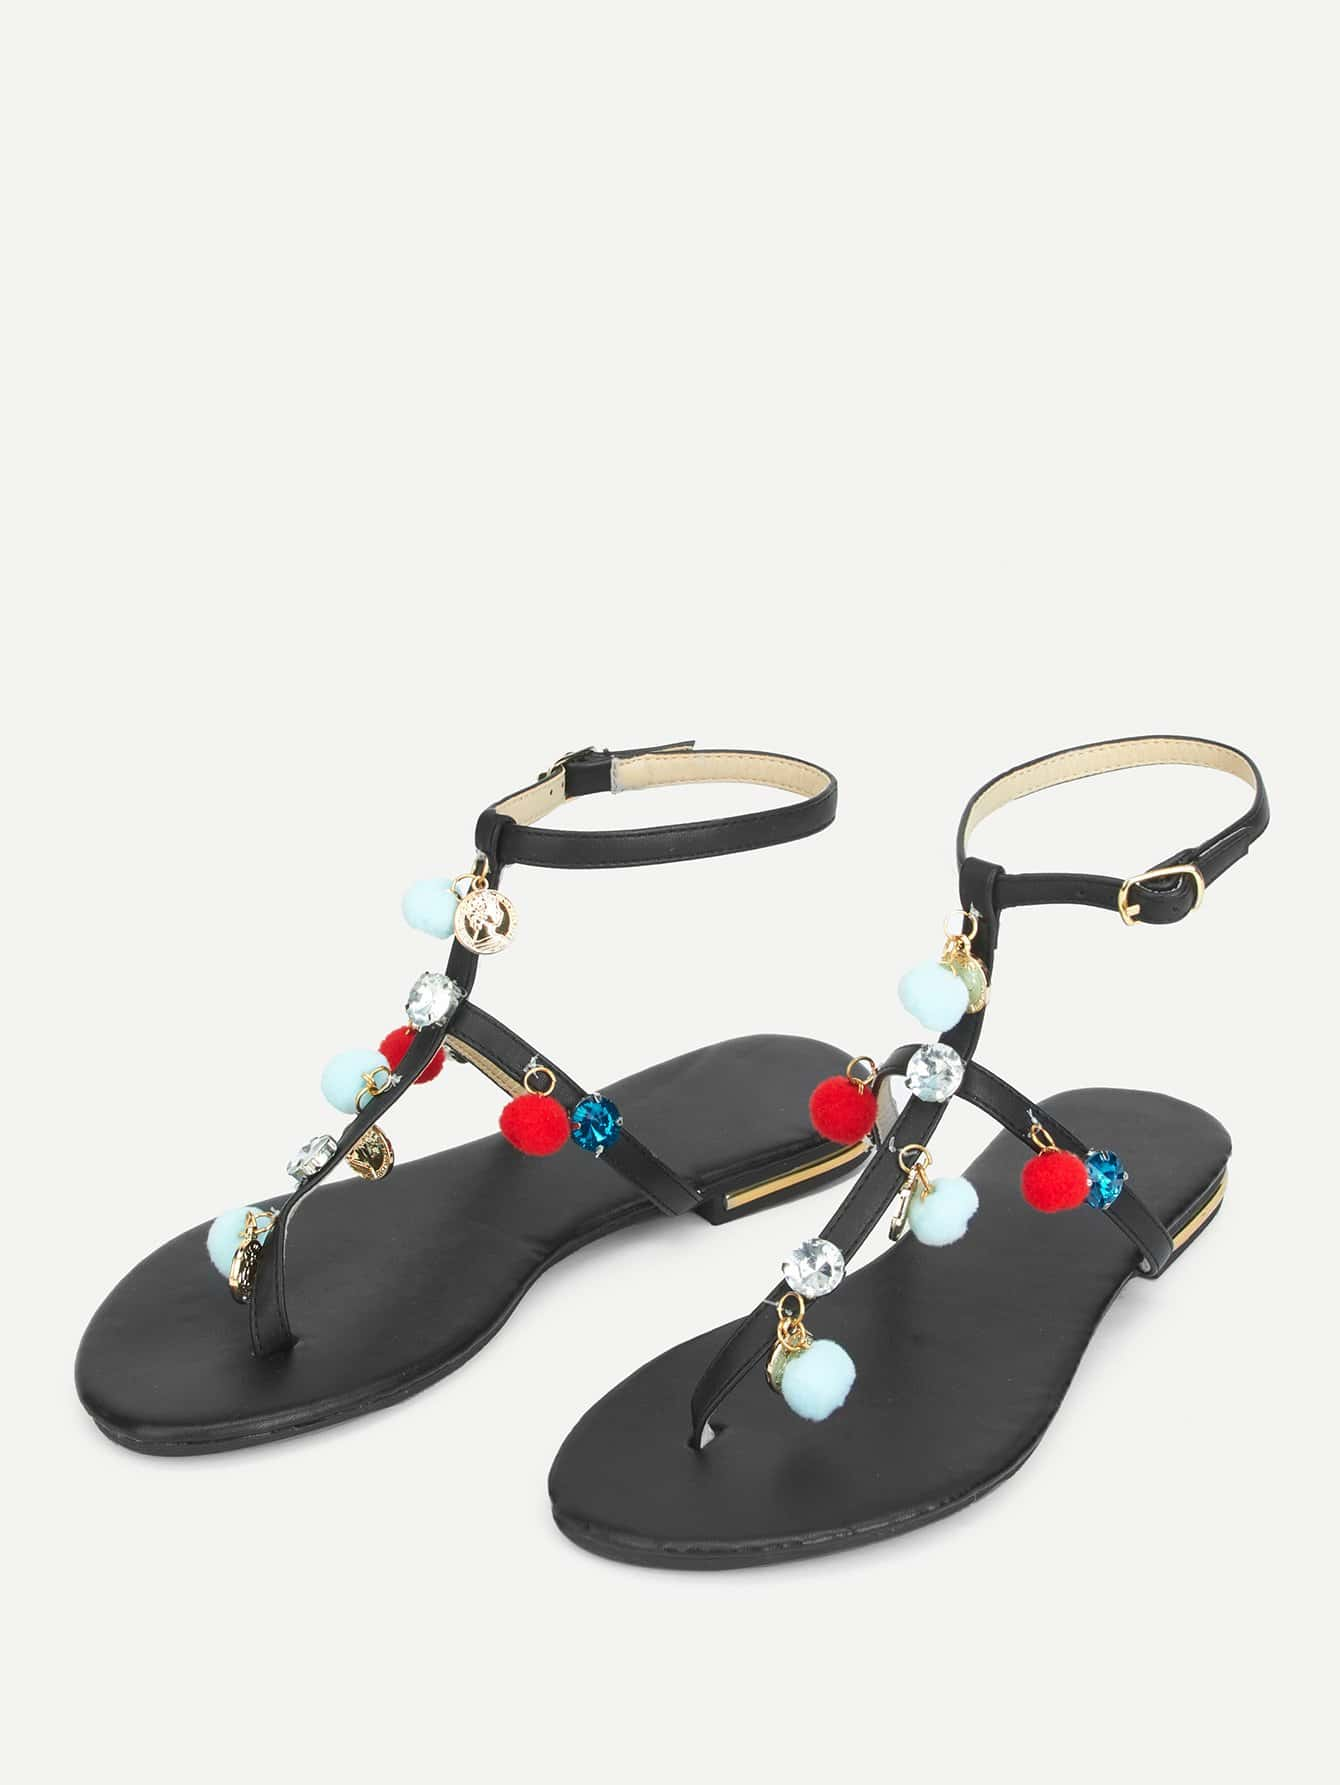 sandales plates avec pompon french romwe. Black Bedroom Furniture Sets. Home Design Ideas